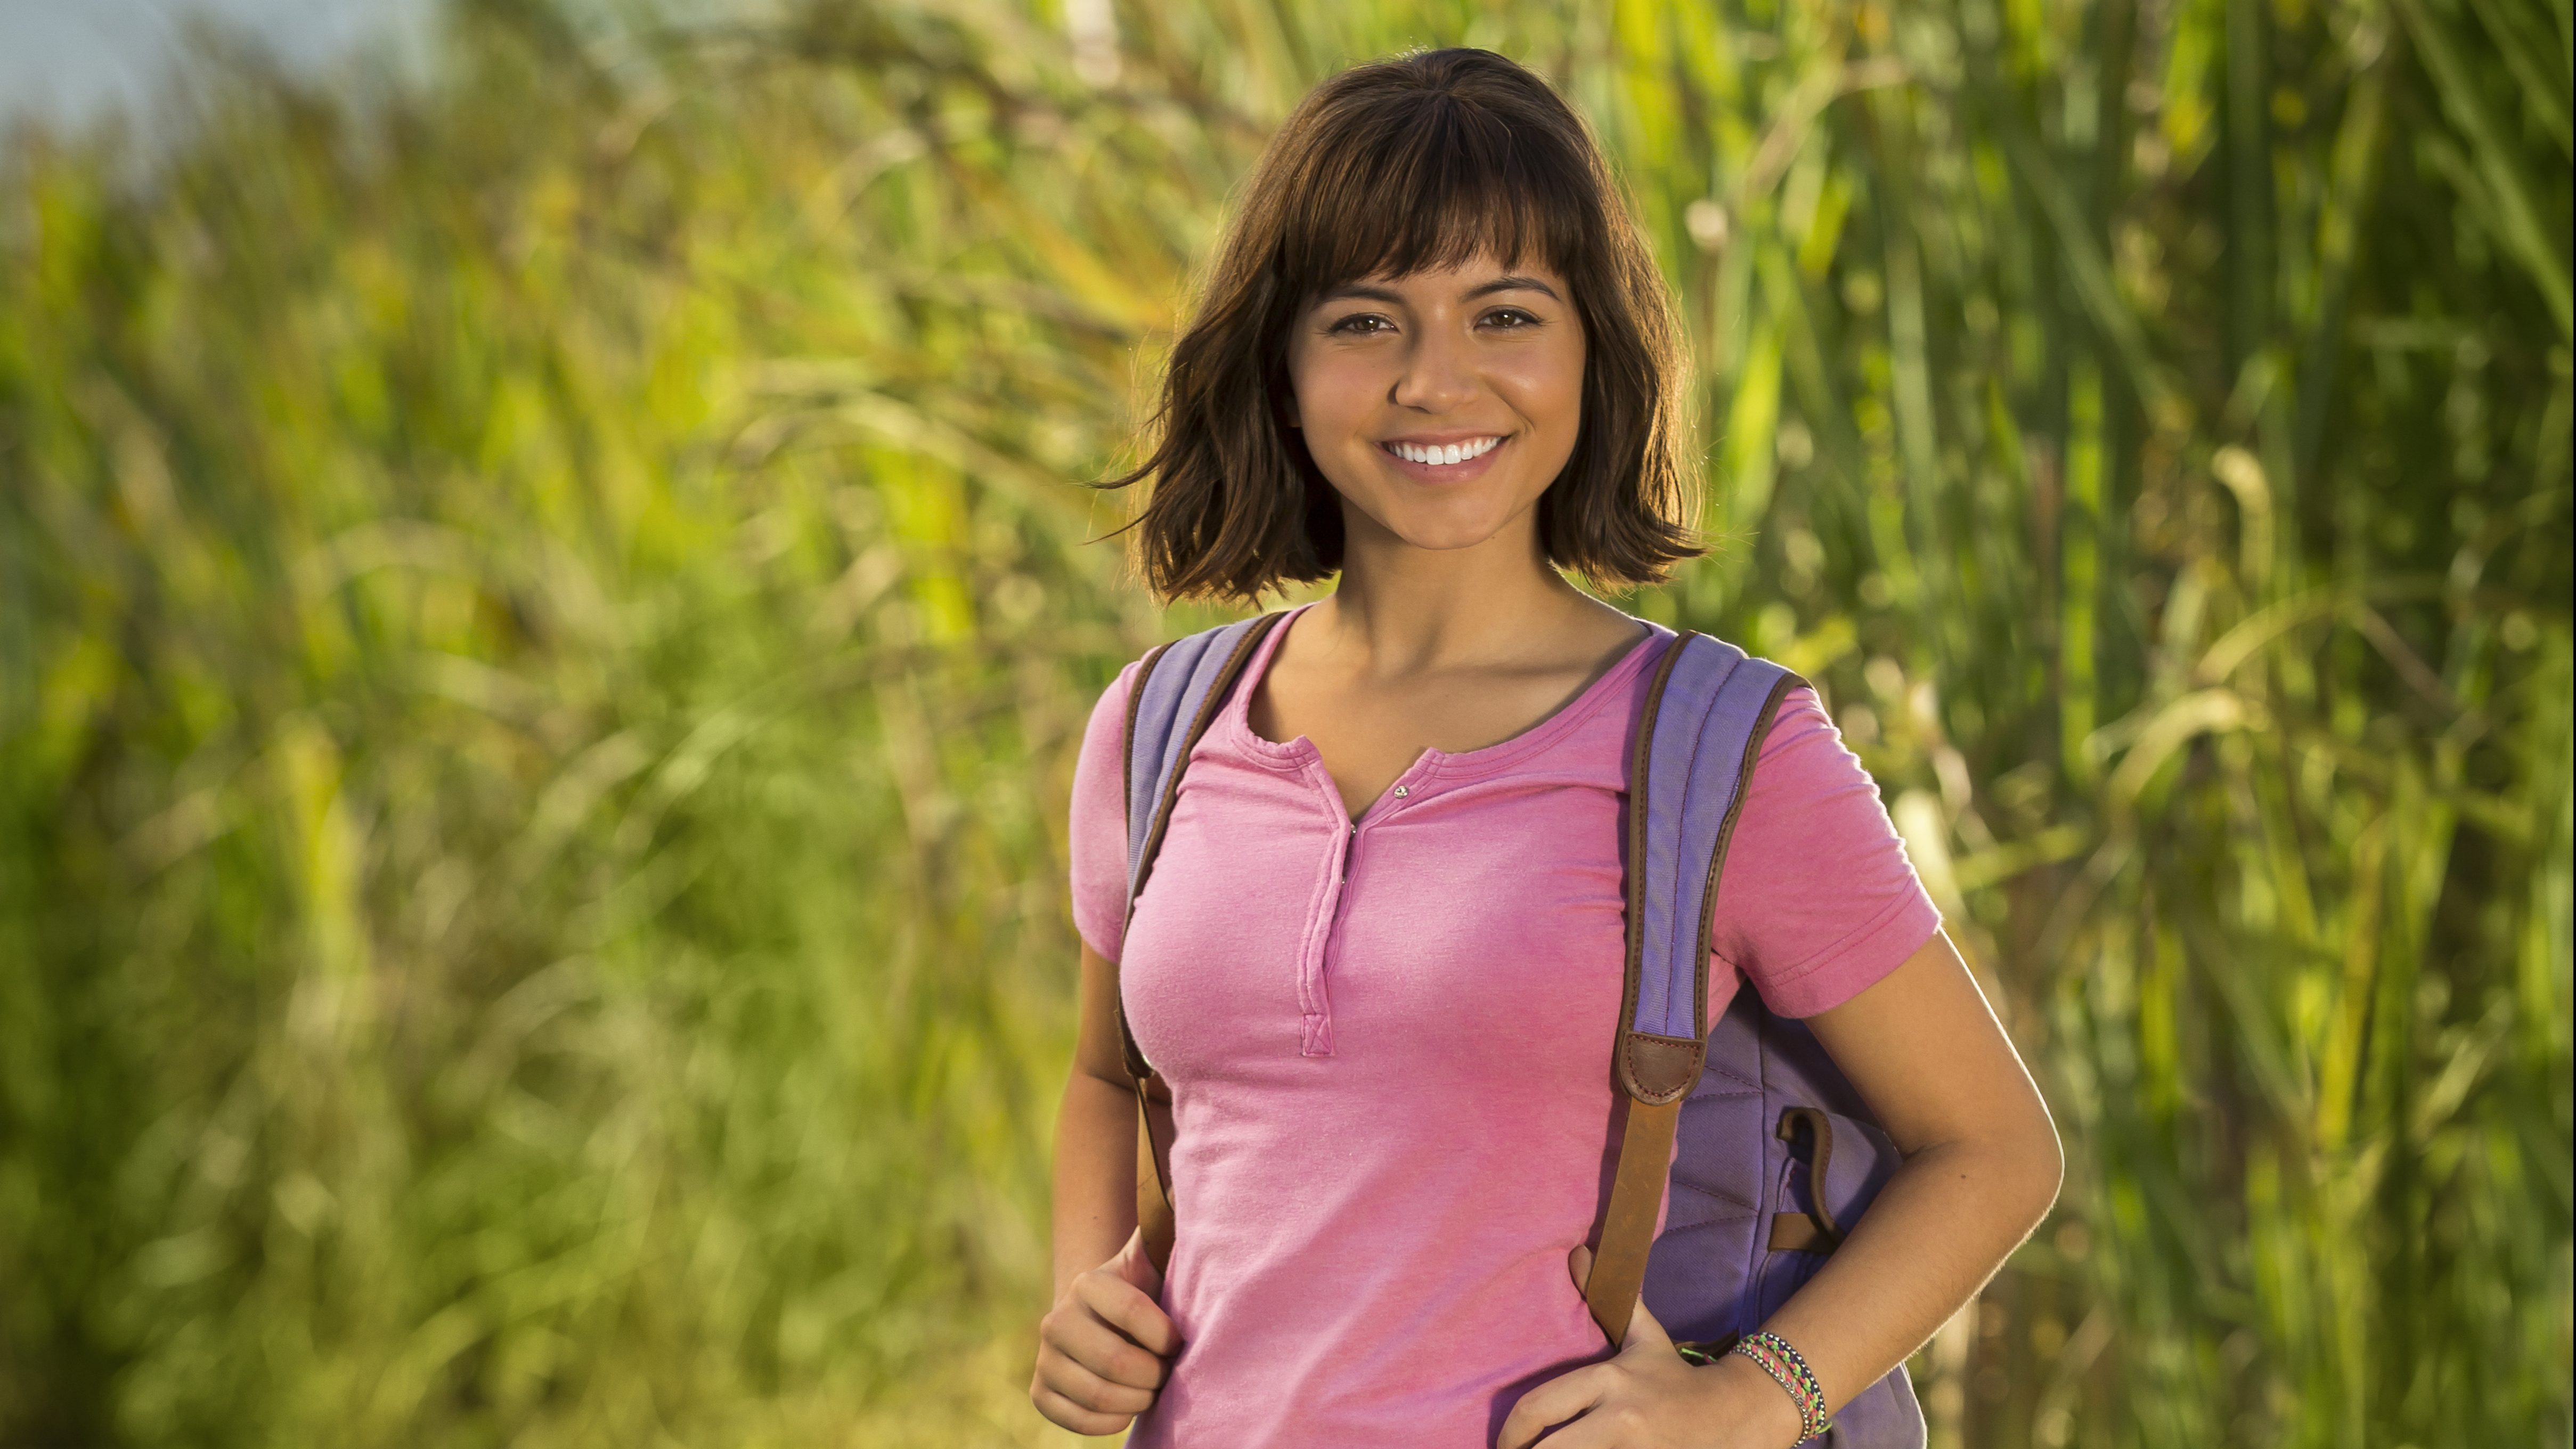 Dora The Explorer Live Action Movie Opening August 2019 Deadline